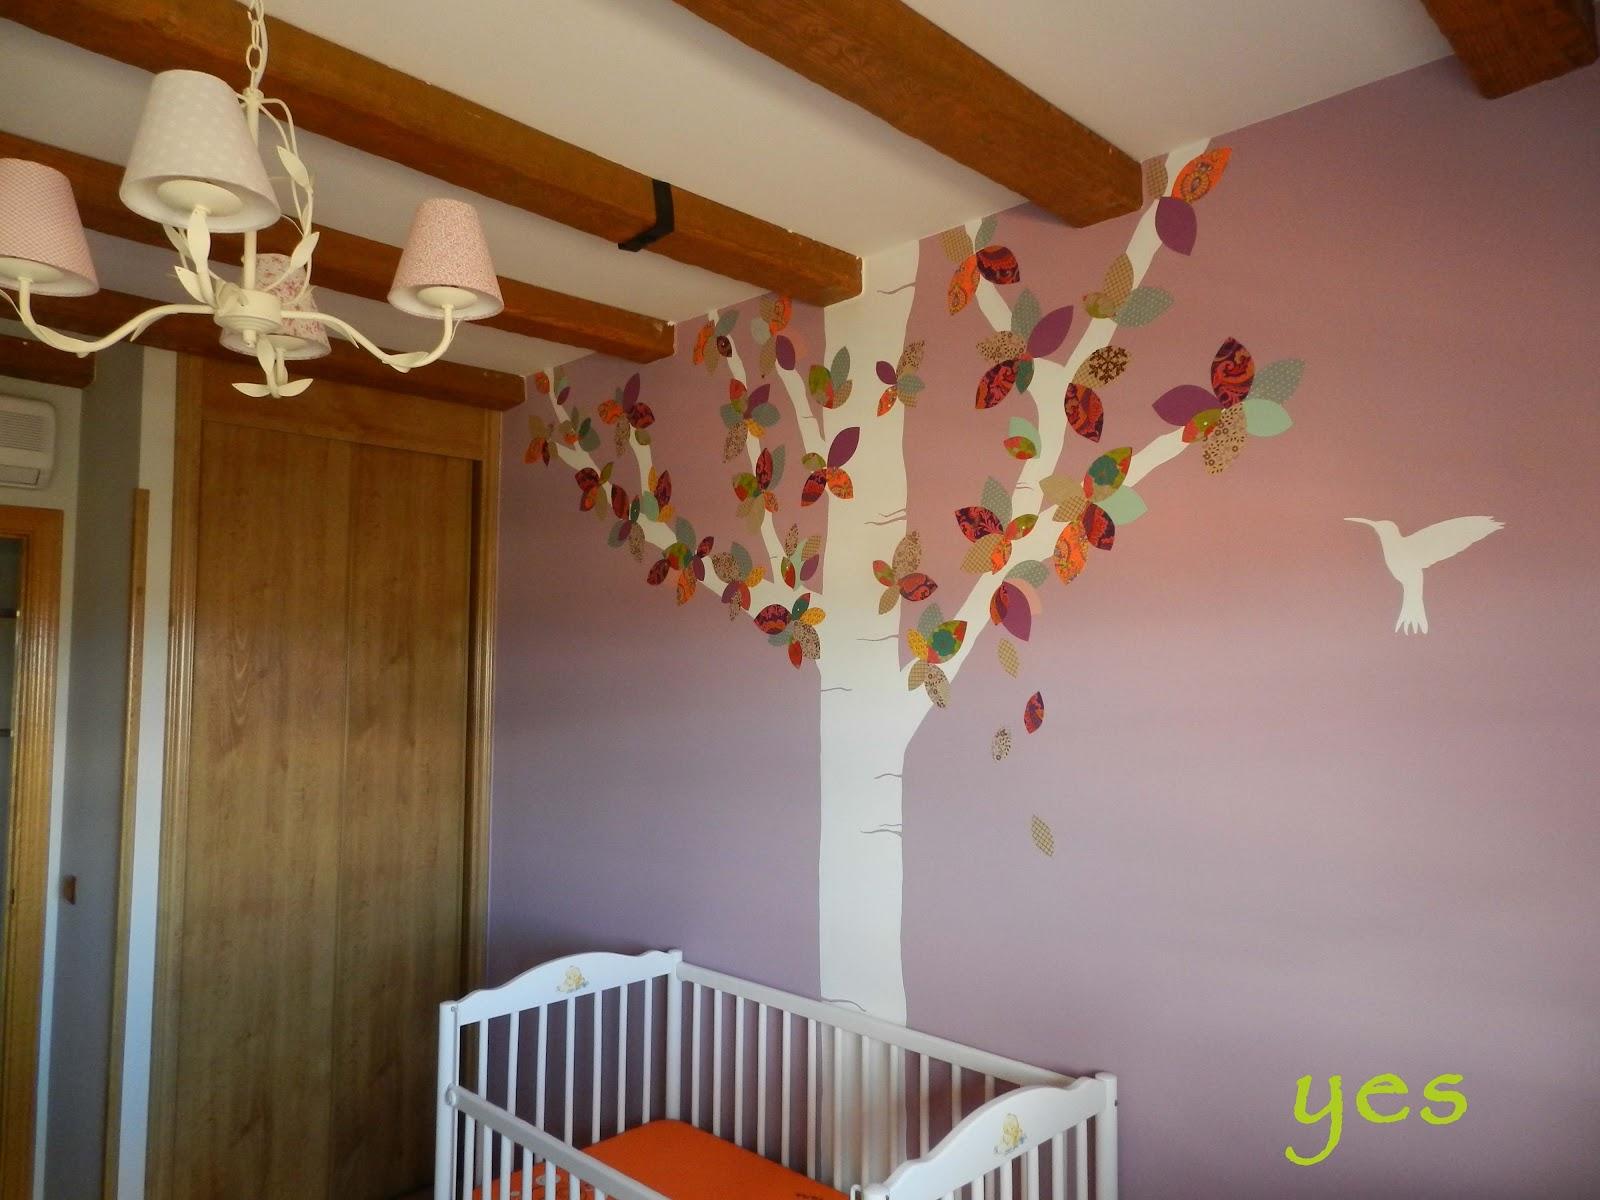 Mercedes torres decoraci n de habitaciones infantiles - Decoraciones habitaciones infantiles ...